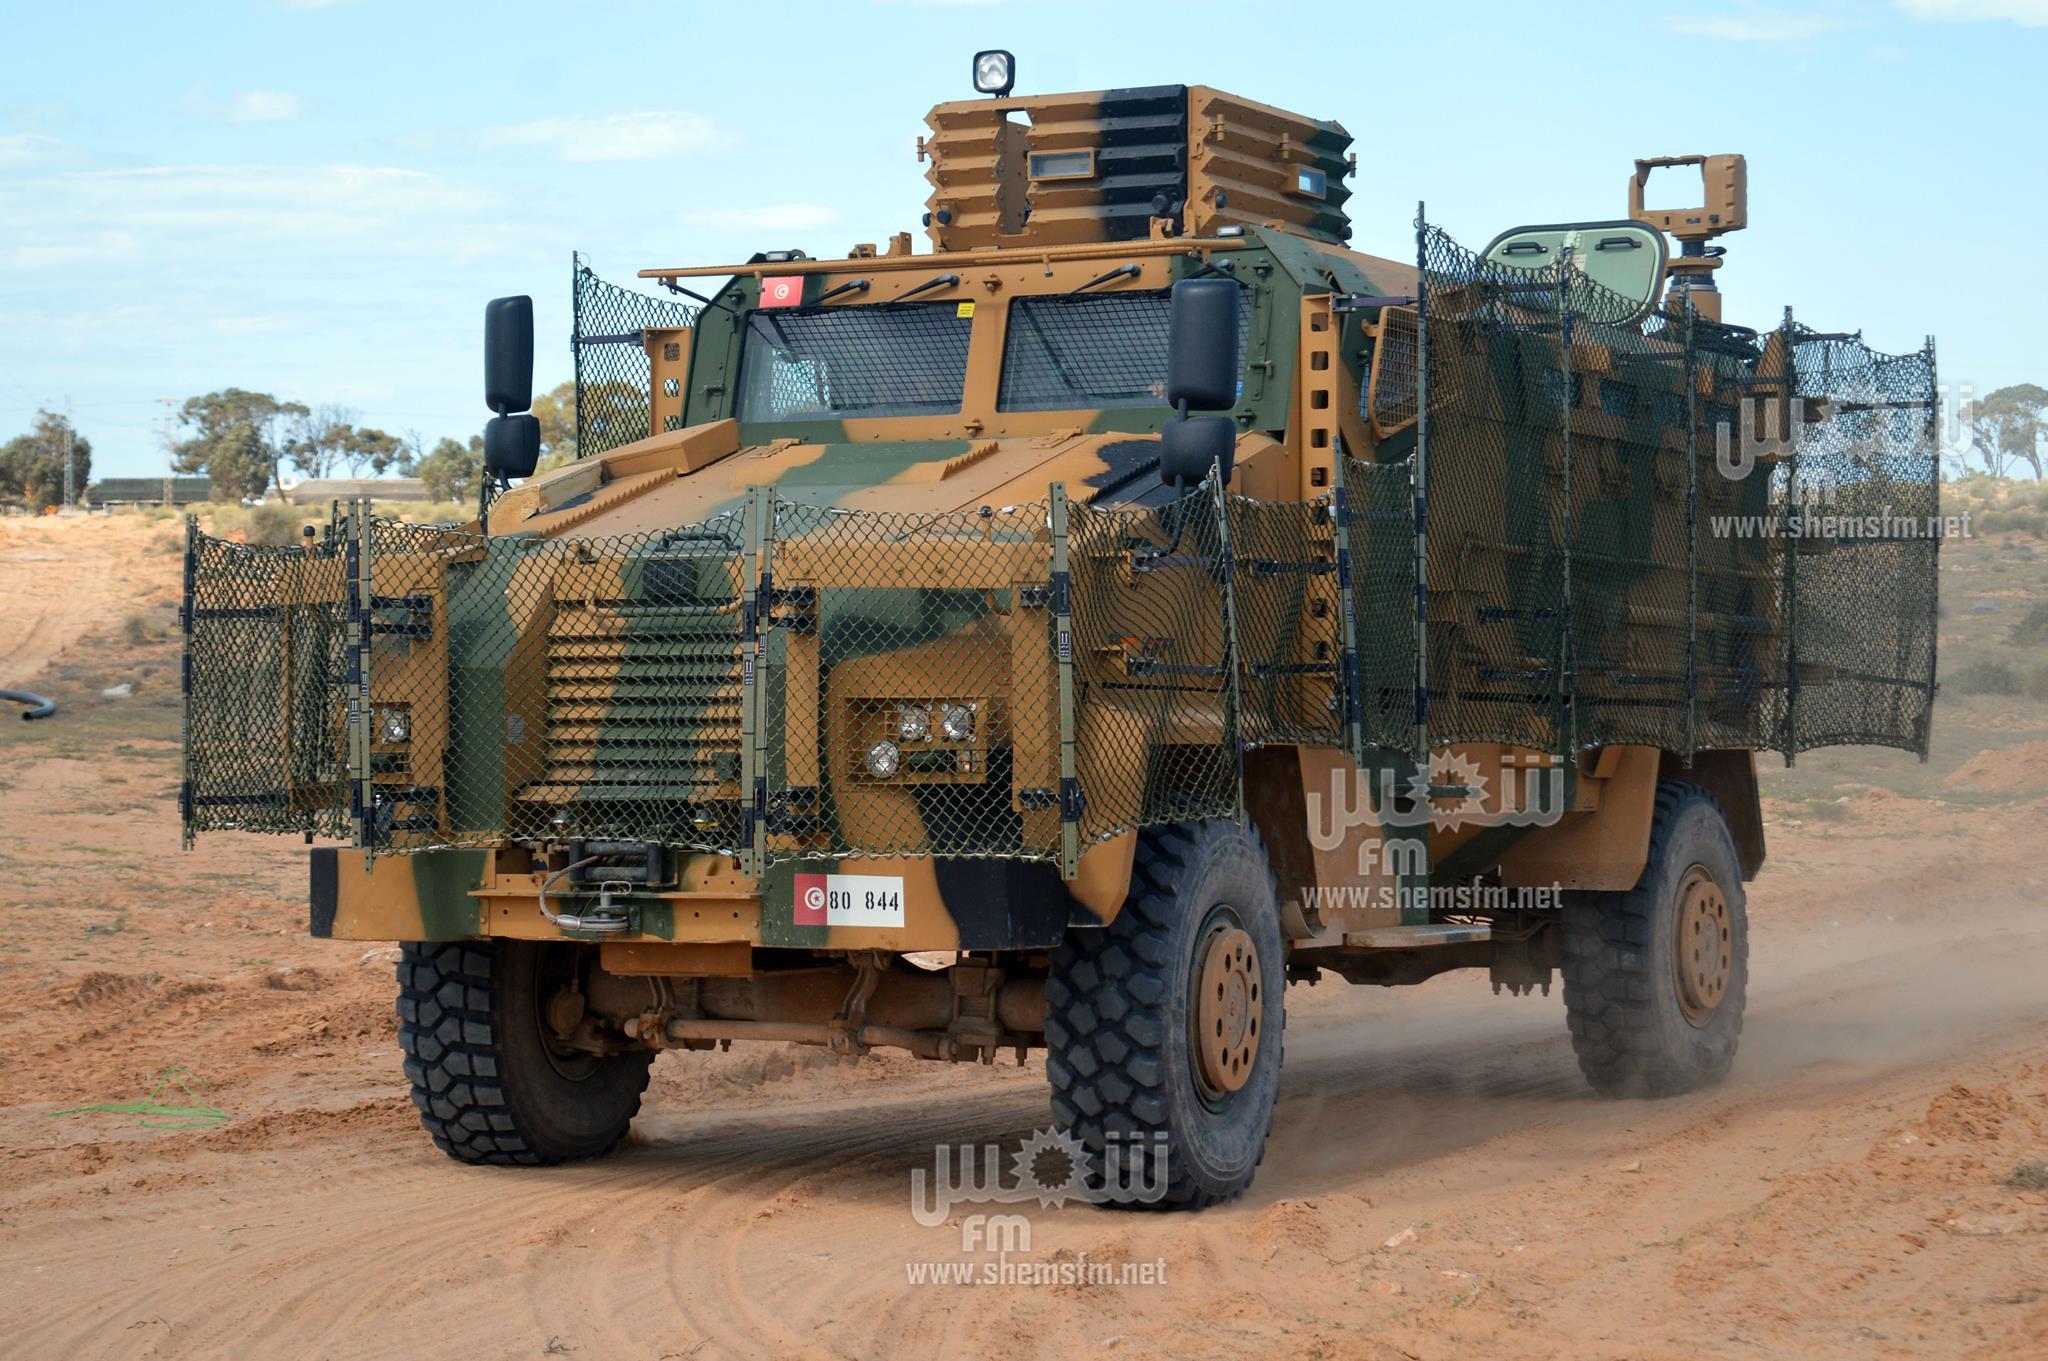 Armée Tunisienne / Tunisian Armed Forces / القوات المسلحة التونسية - Page 16 54514807-2405111126176825-1467424539305574400-o